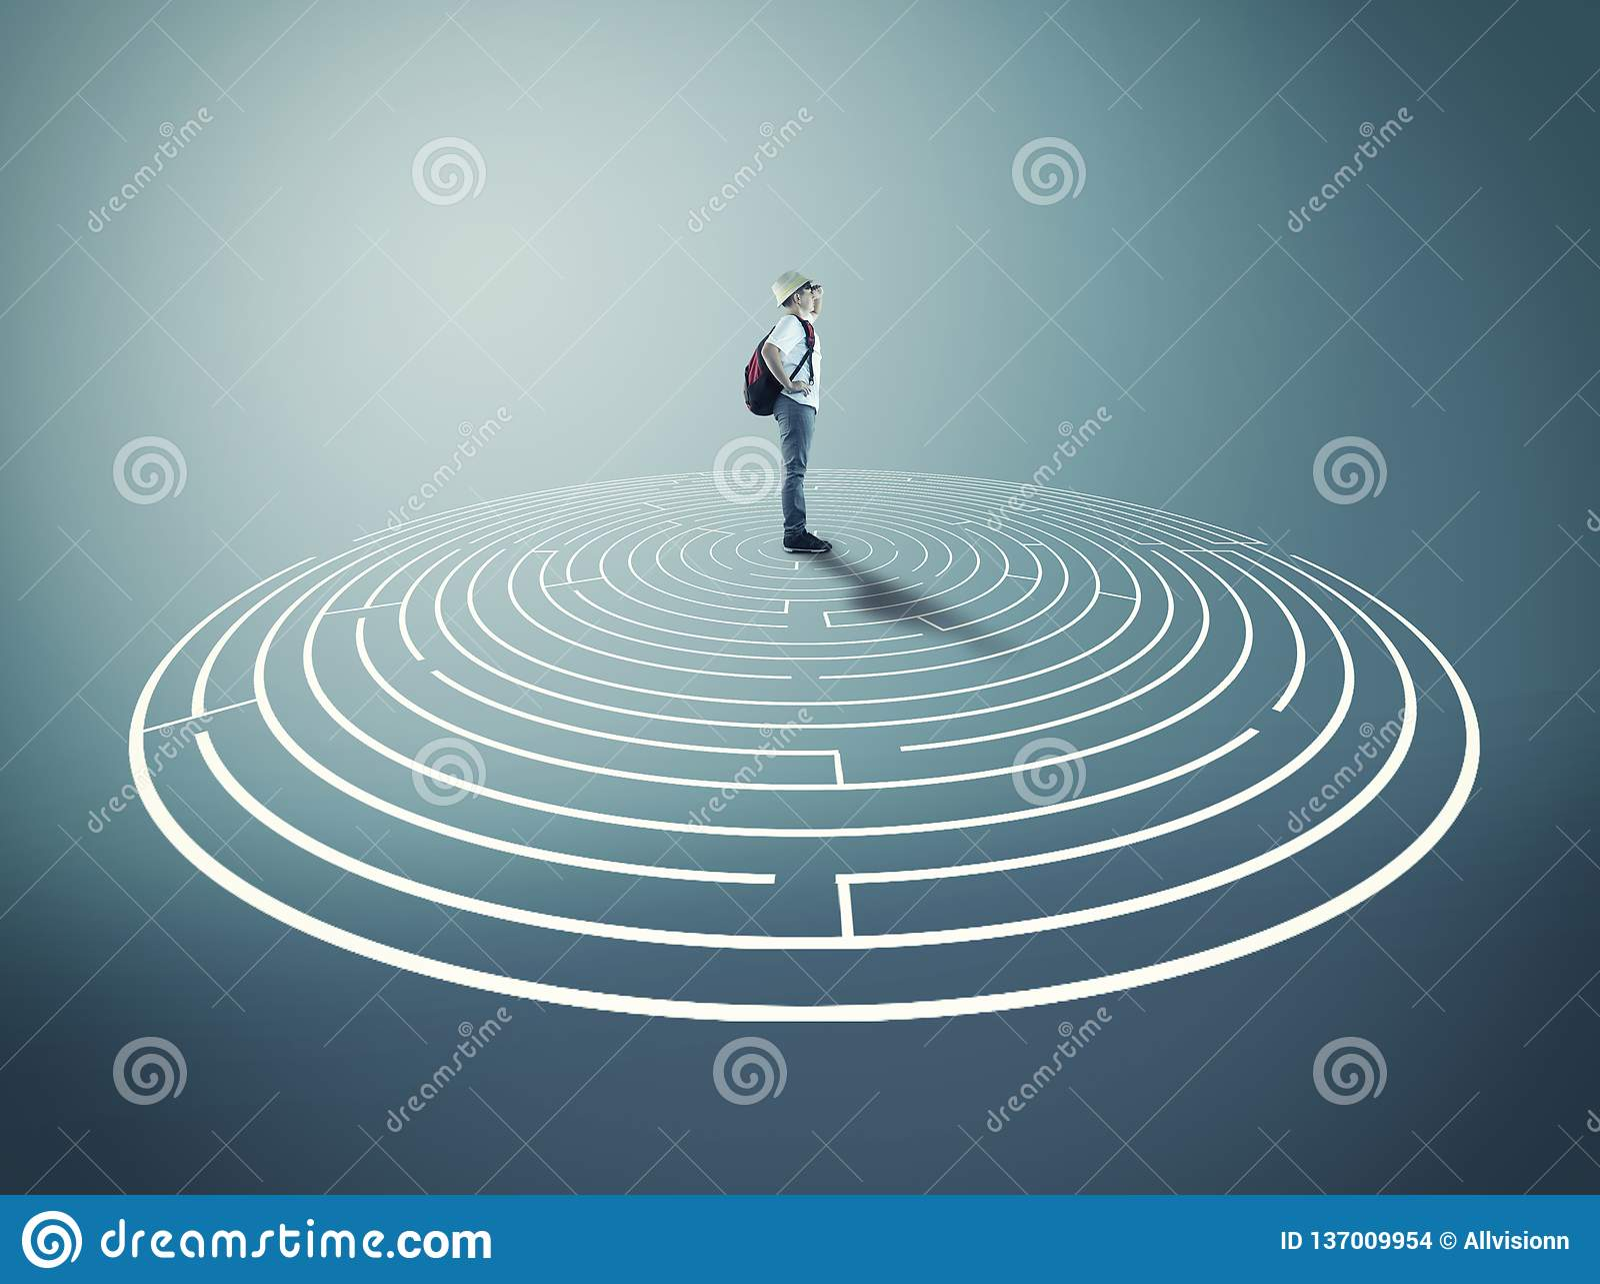 Resolva o labirinto